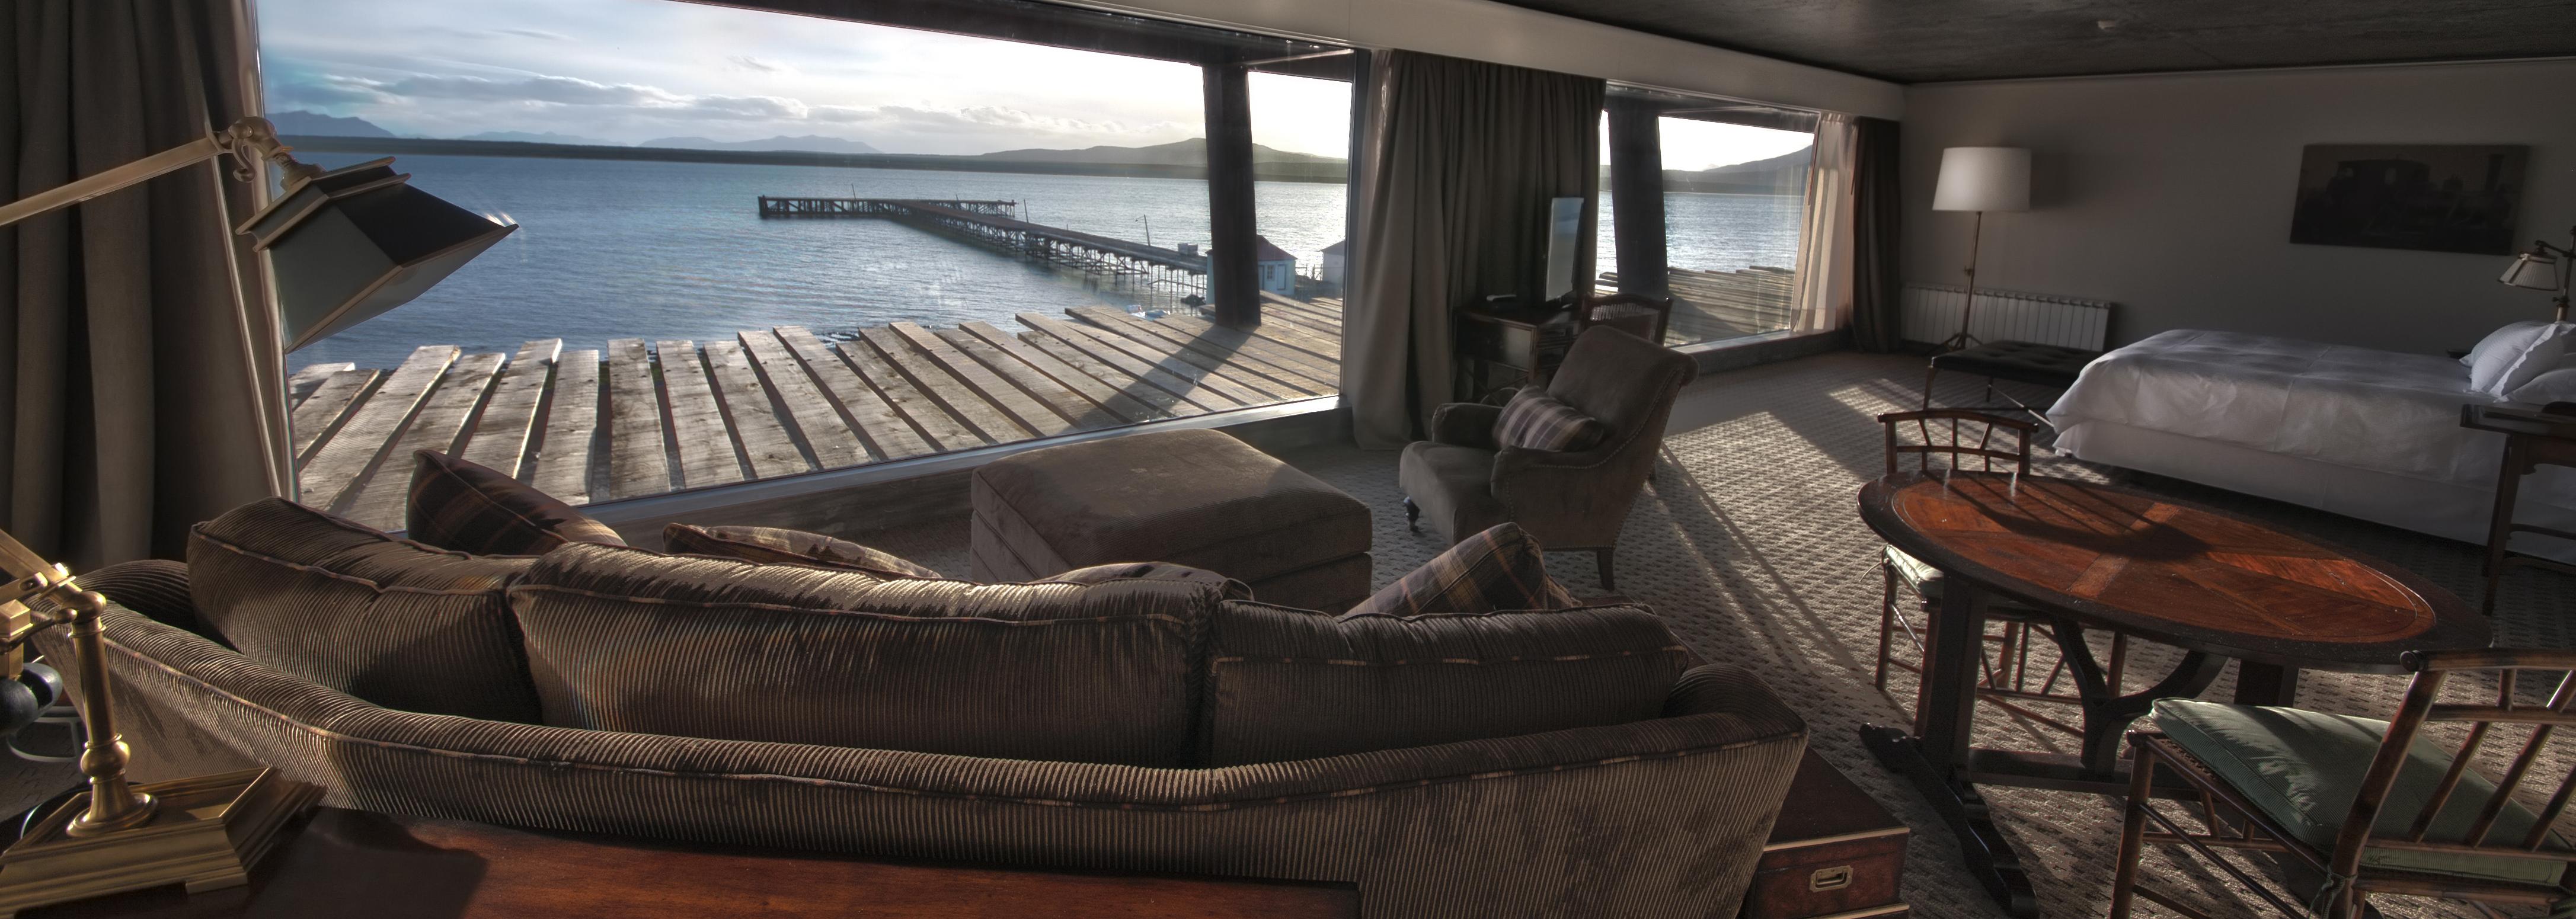 singular-patagonia-hotel-suite